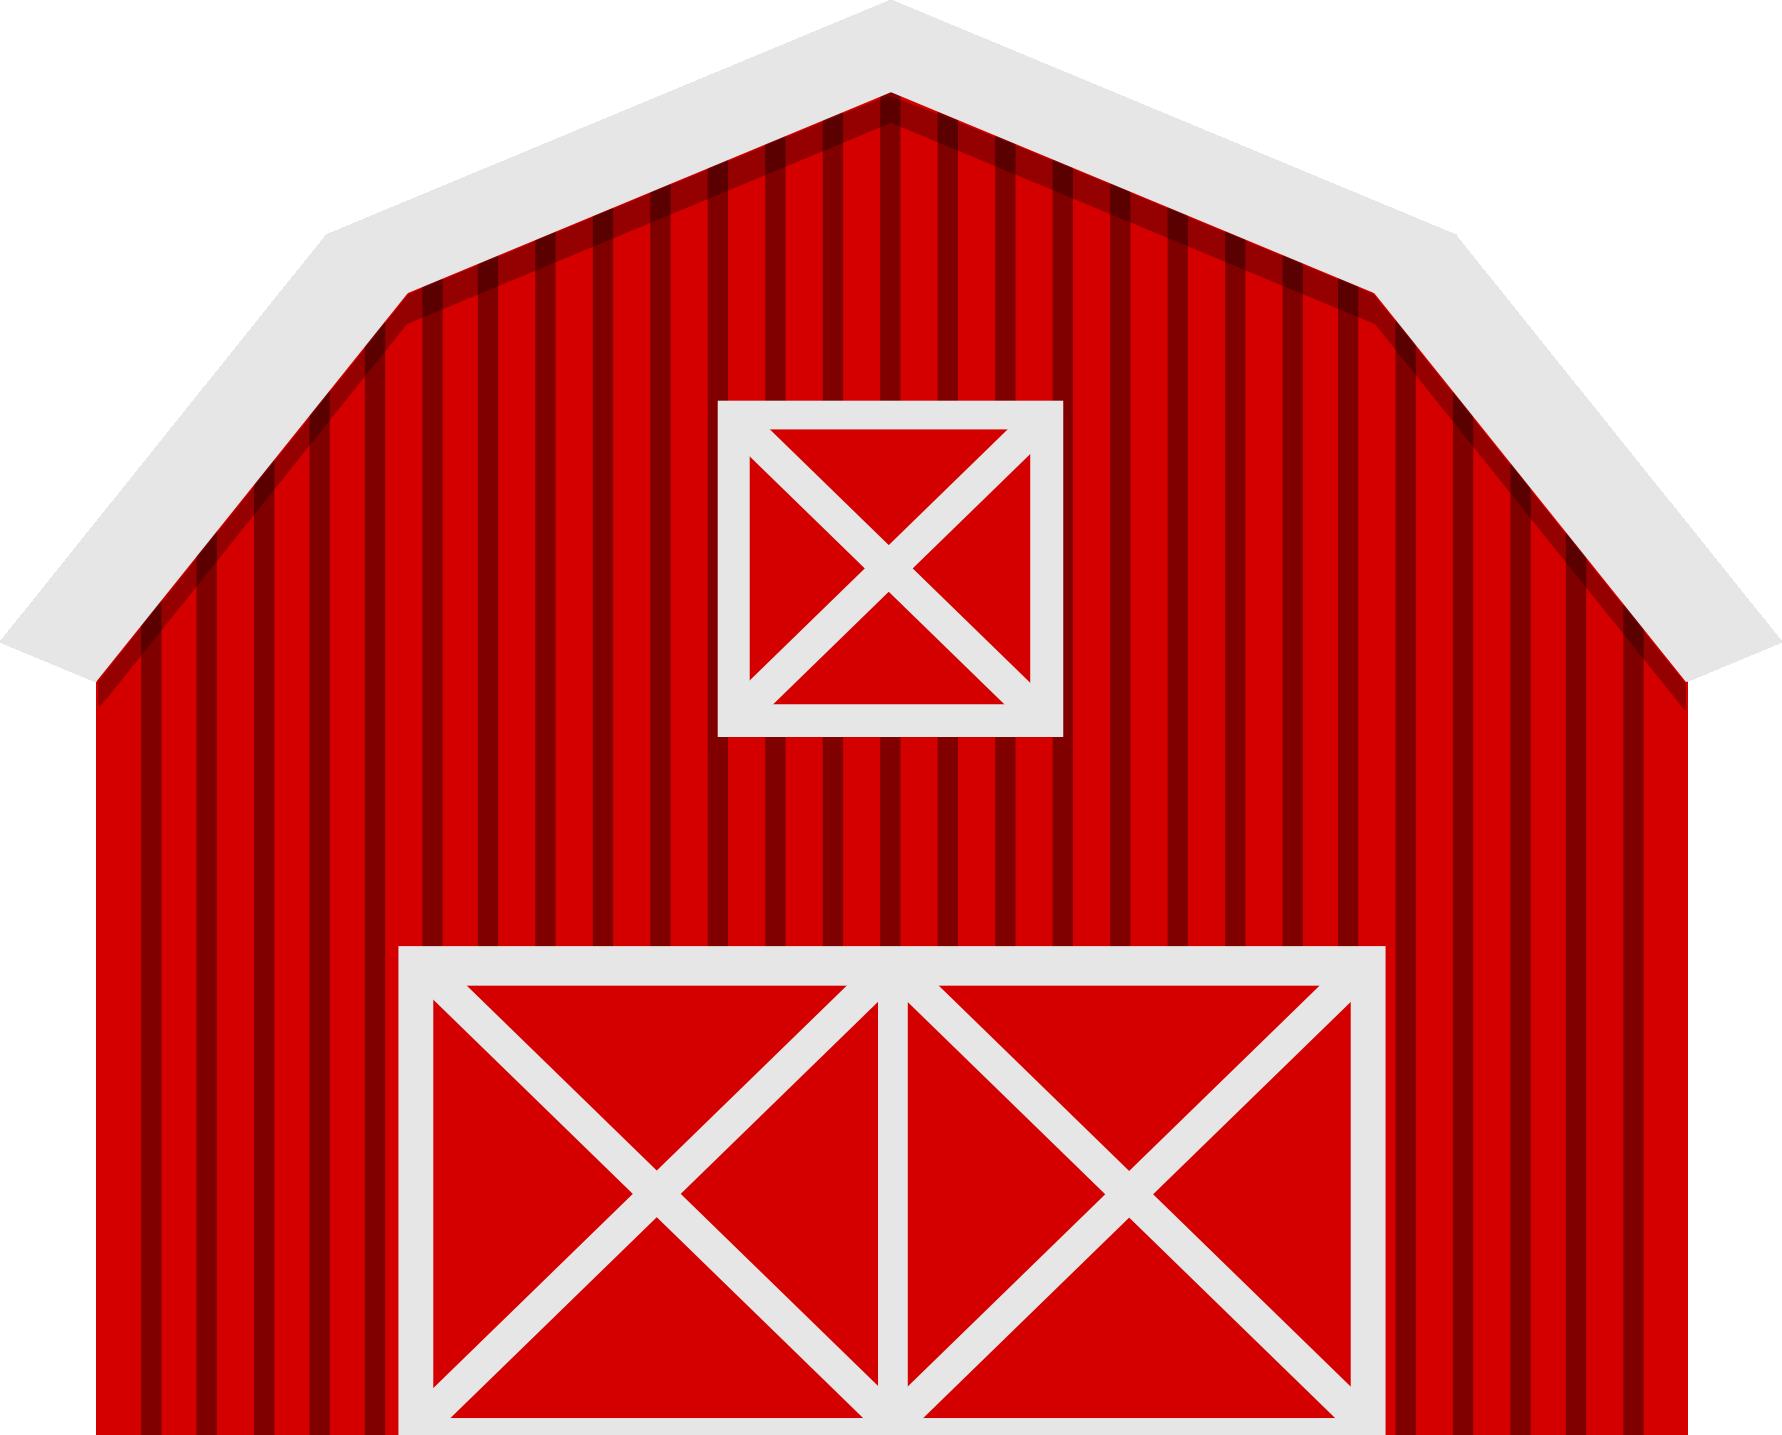 Barn Clipart Transparent Background.